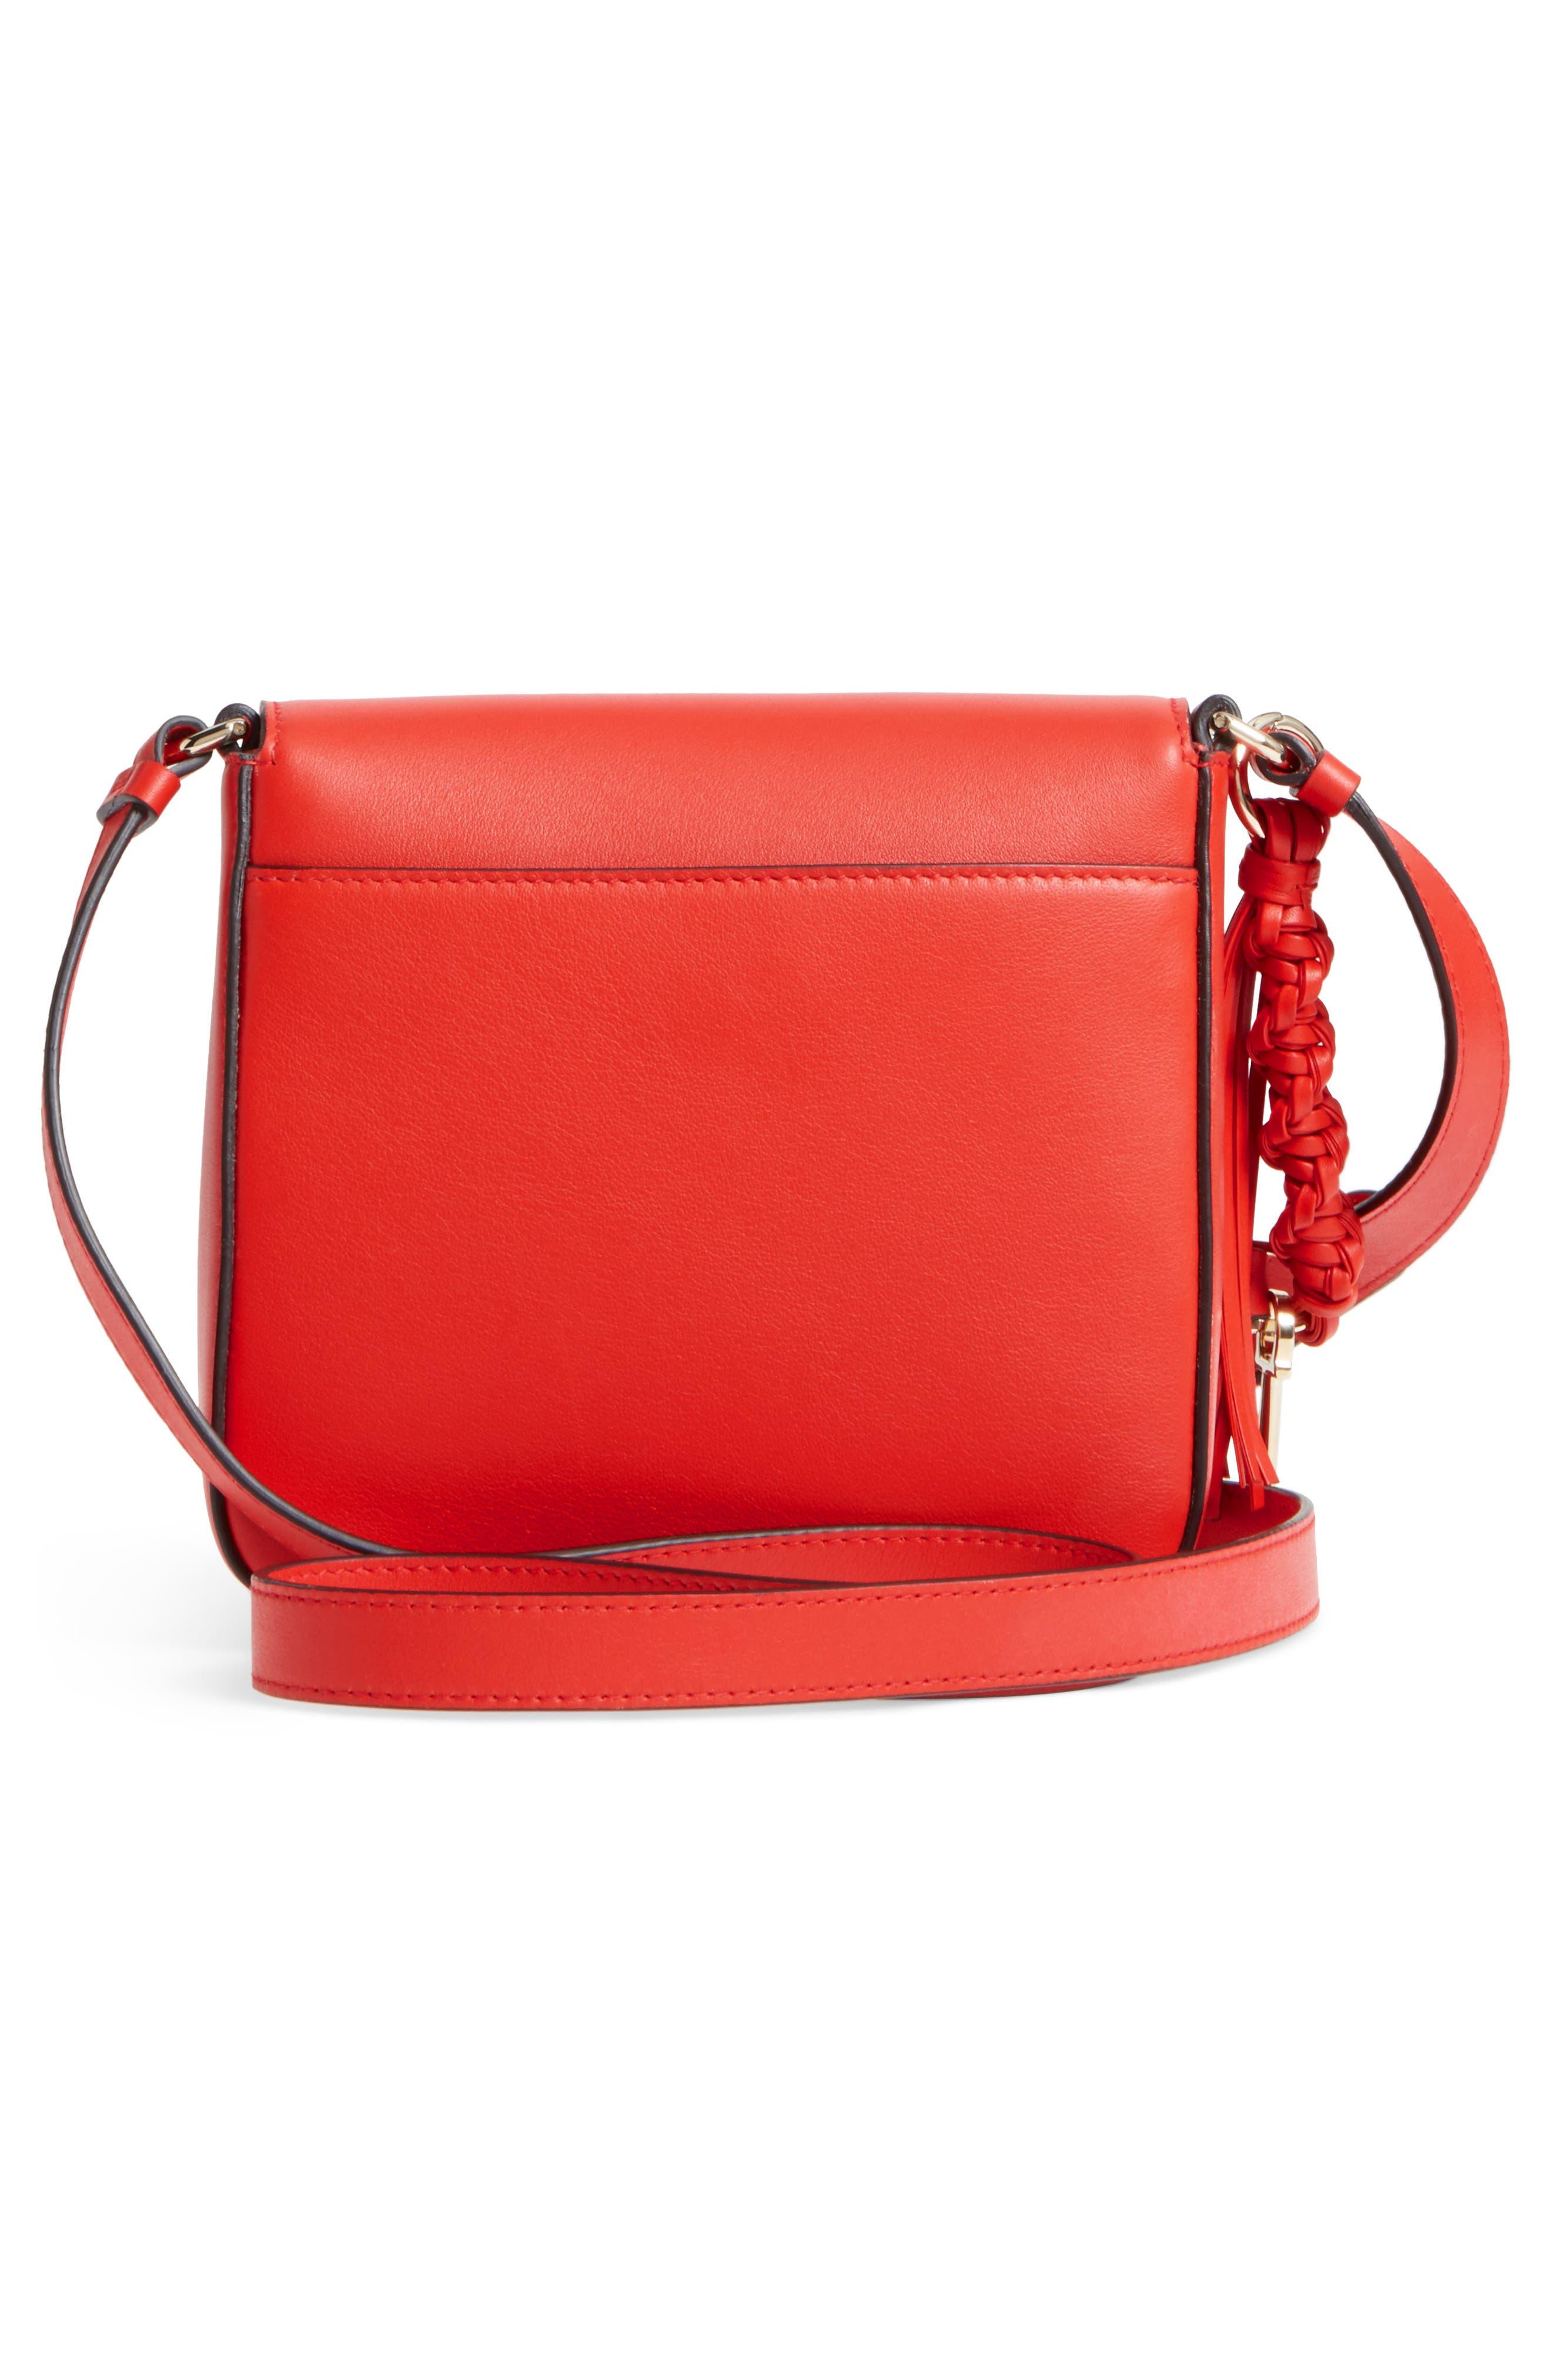 Alternate Image 3  - Salvatore Ferragamo Gancio Lock Leather Crossbody Bag